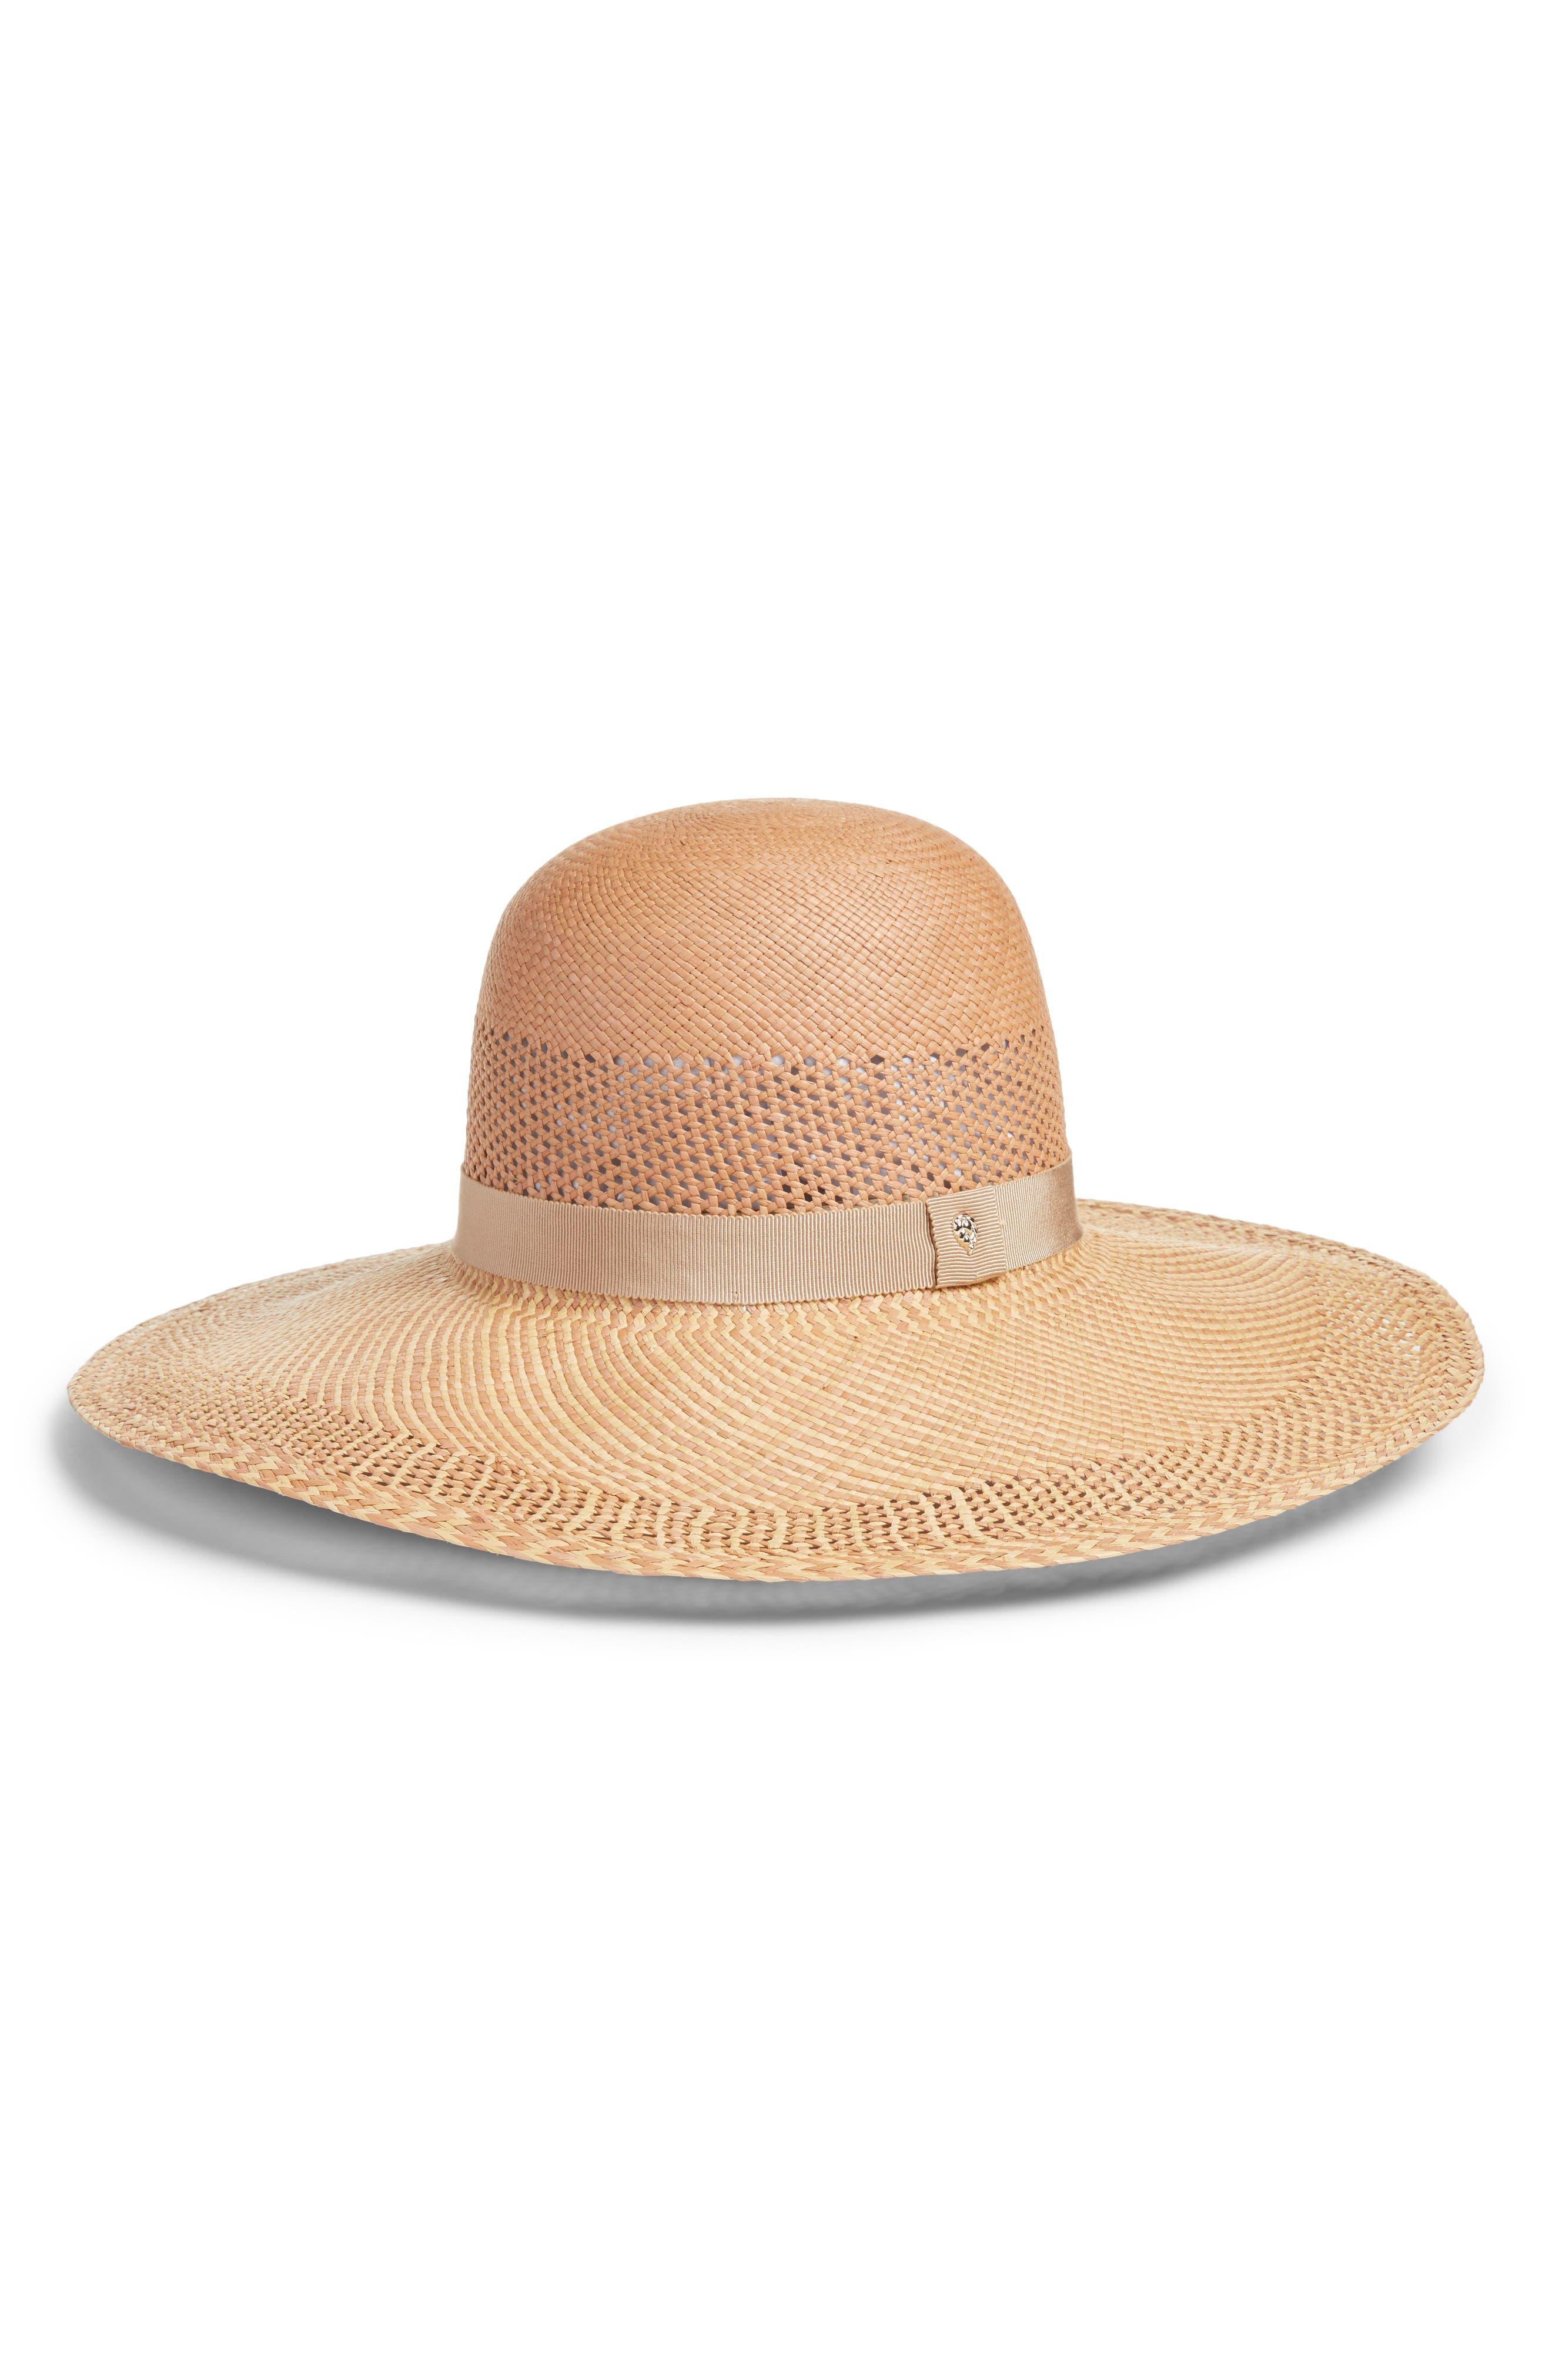 Azuay Palm Sun Hat,                             Main thumbnail 1, color,                             Rosetta Almond/ Nude